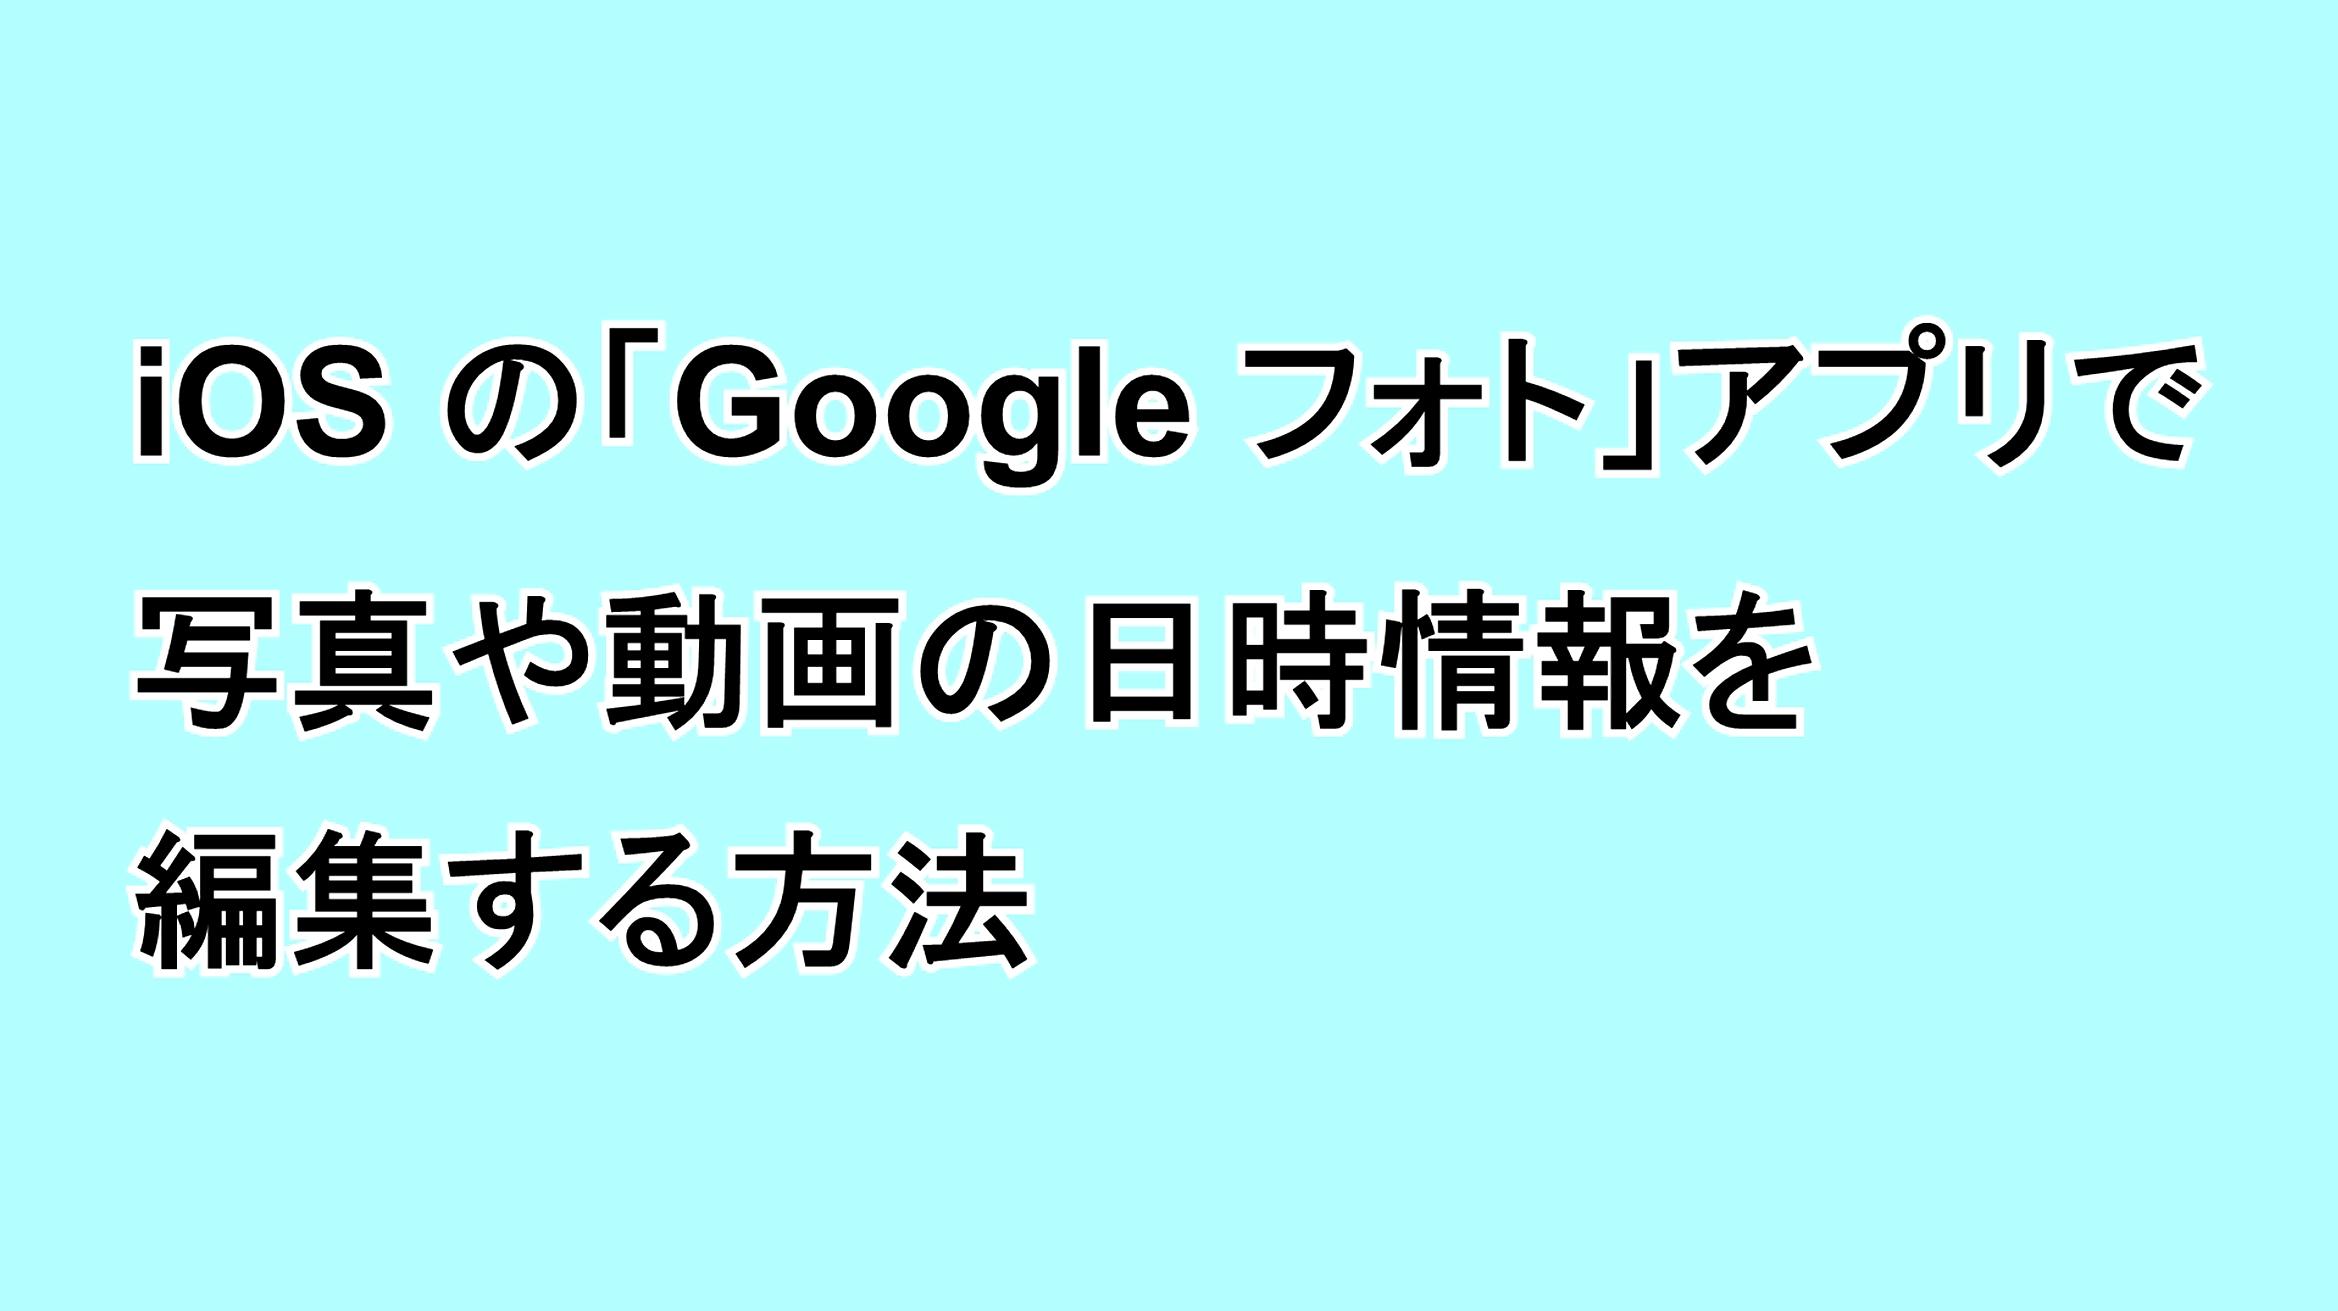 iPhone(iOS)の「Google フォト」アプリで写真や動画の日時情報を編集する方法